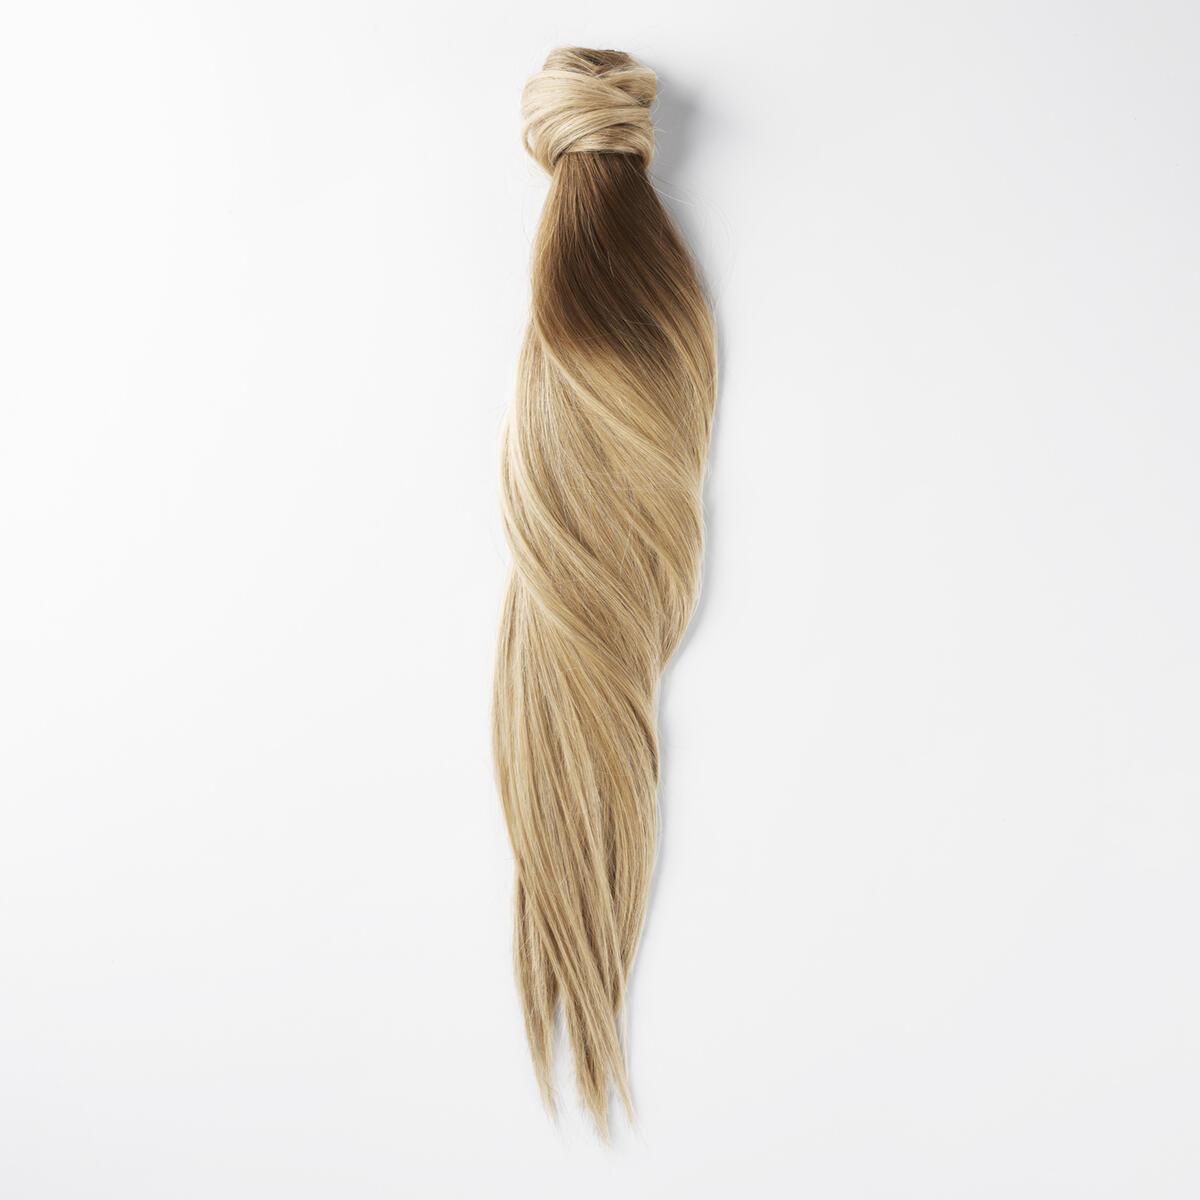 Clip-in Ponytail Ponytail made of real hair B5.4/7.2 Cinnamon Blonde Balayage 50 cm